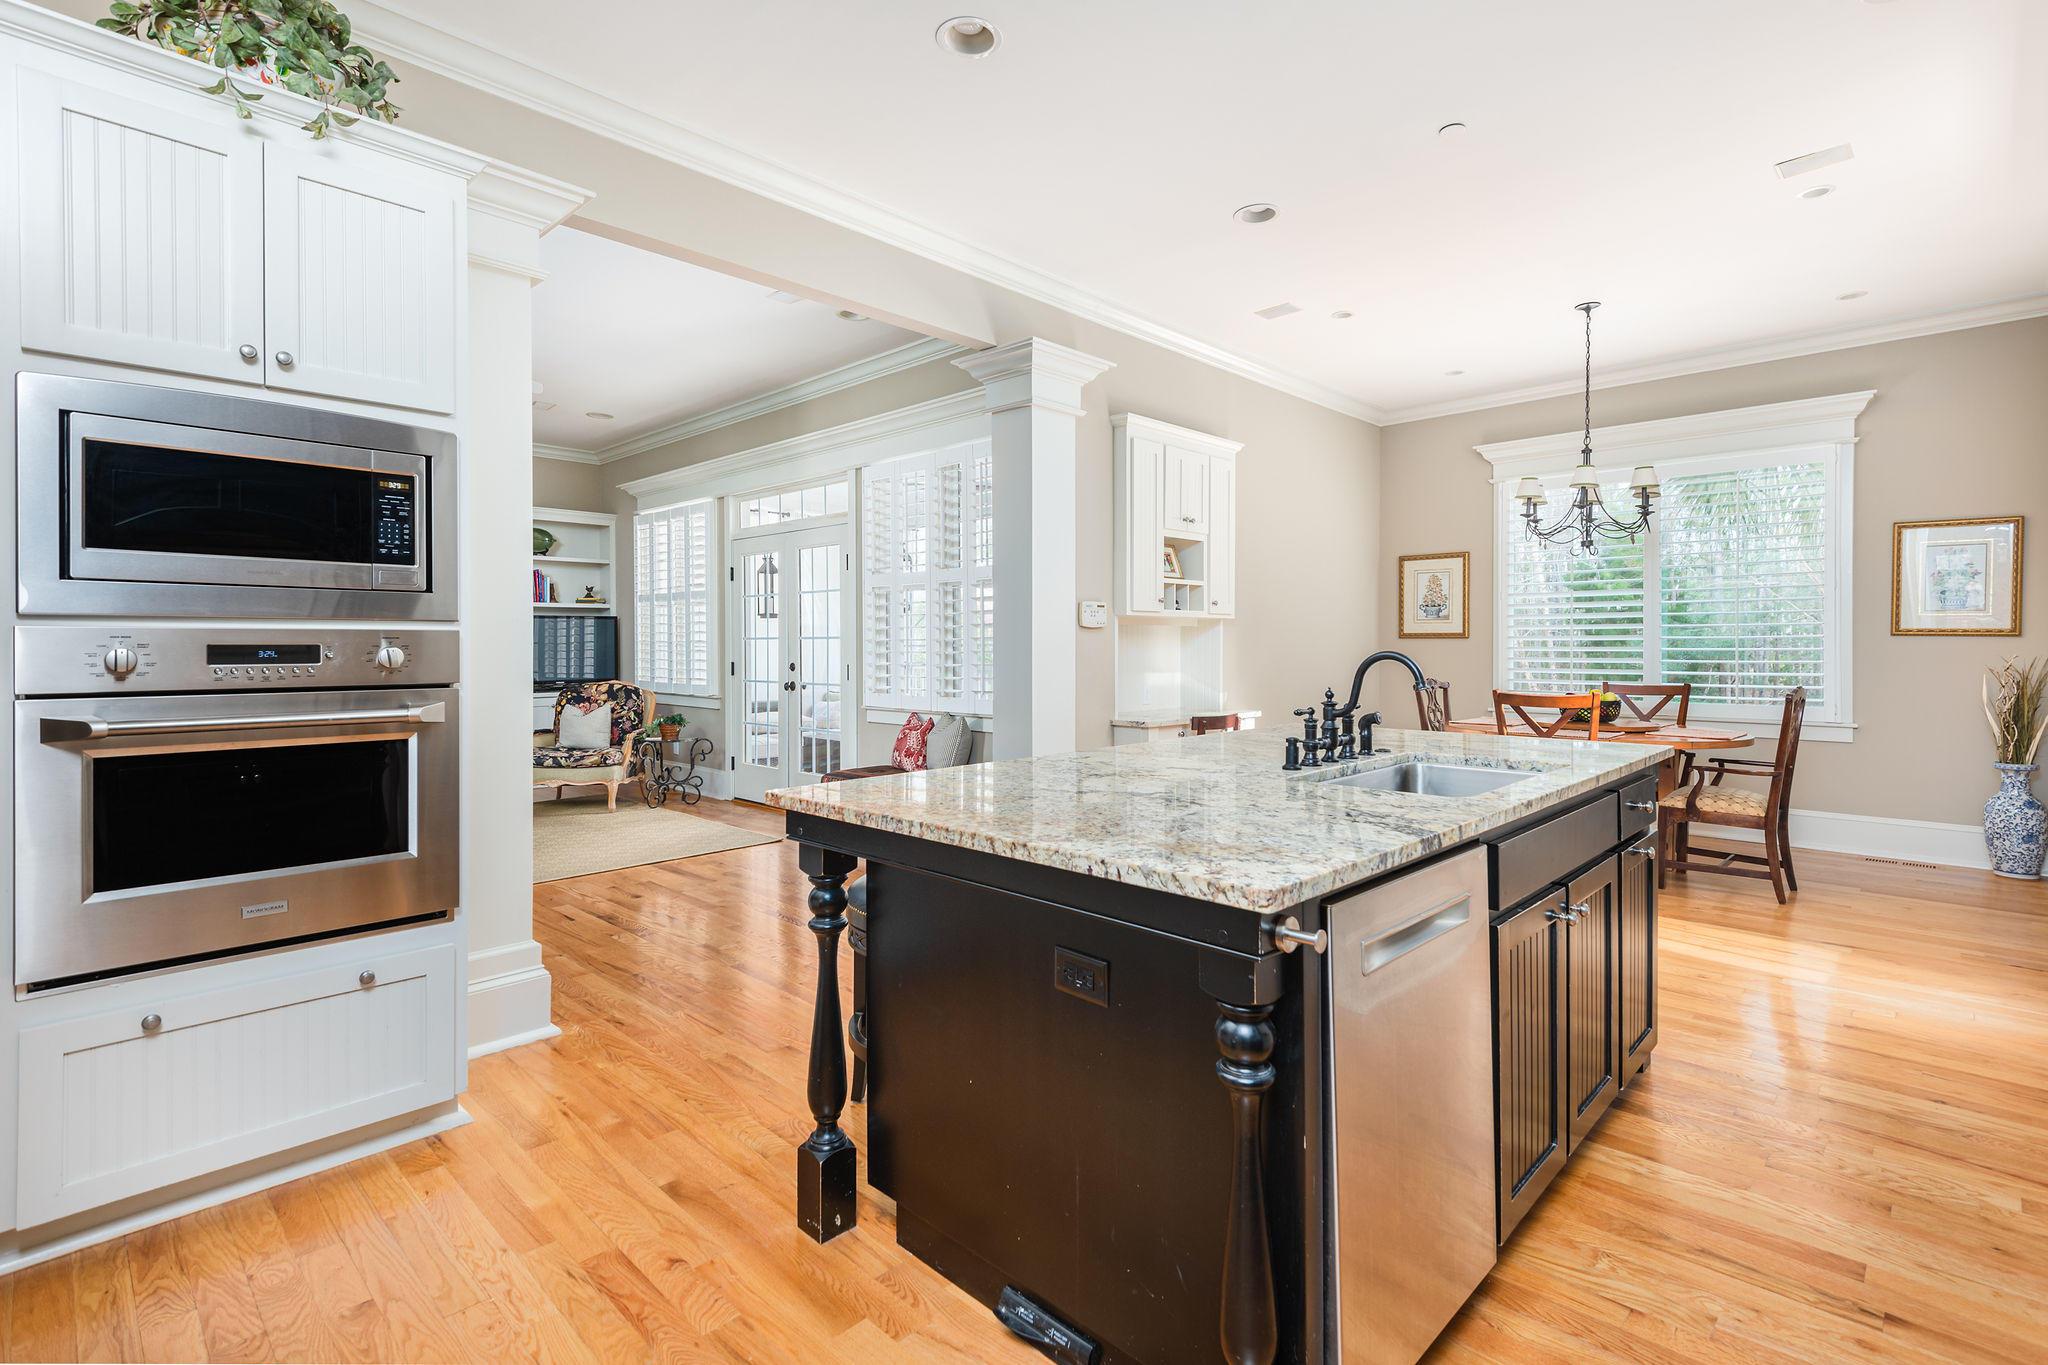 Dunes West Homes For Sale - 1305 King Bird, Mount Pleasant, SC - 54